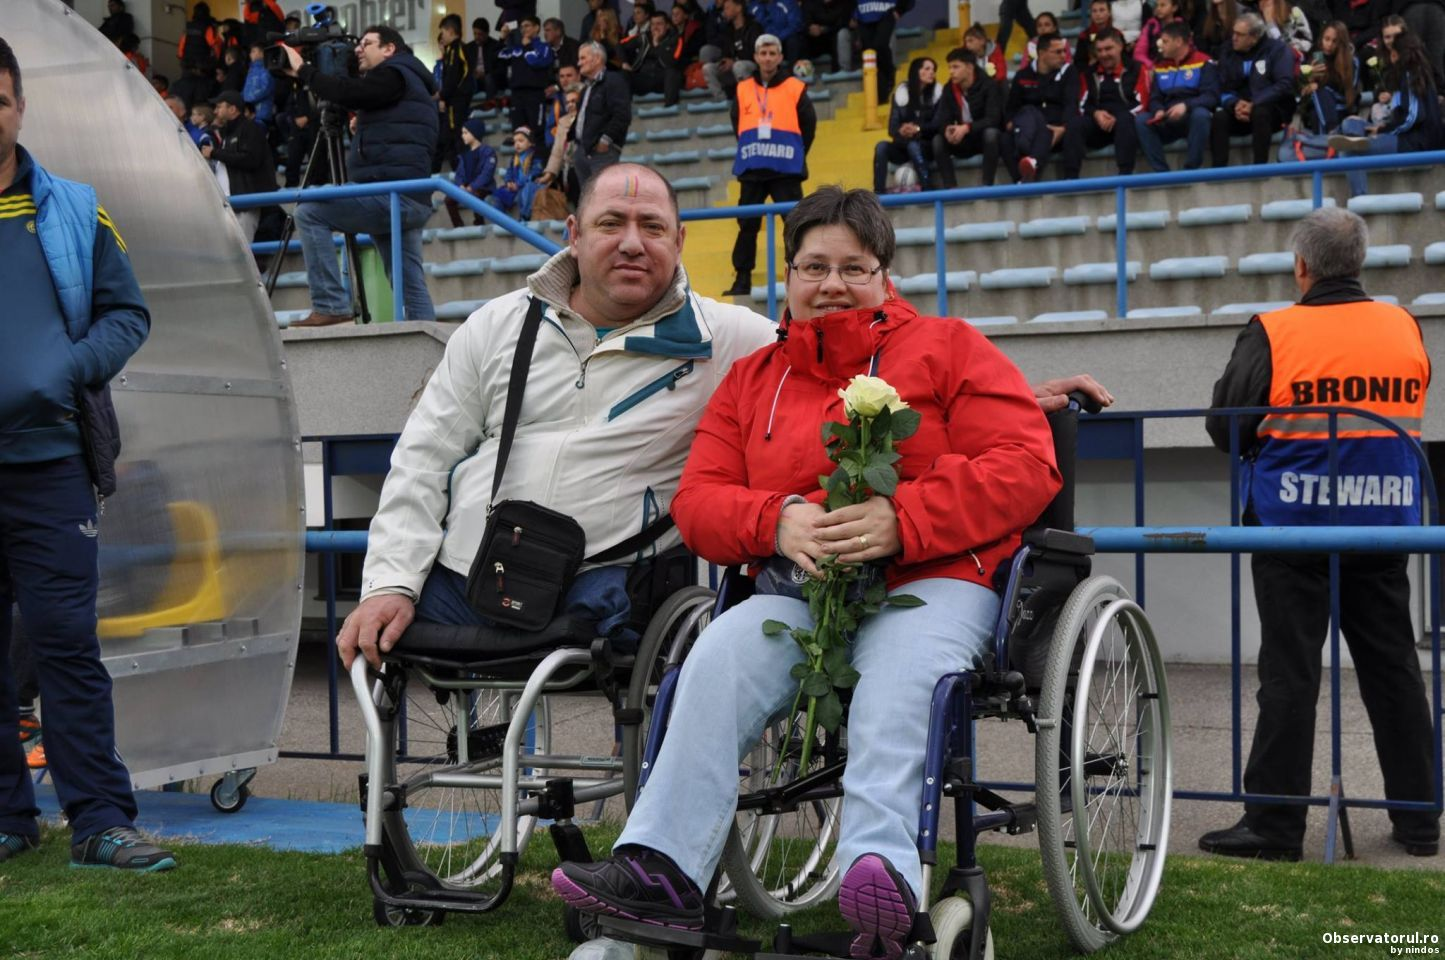 Persoanele cu dizabilitati au urmarit antrenamentul deschis al echipei nationale de fotbal